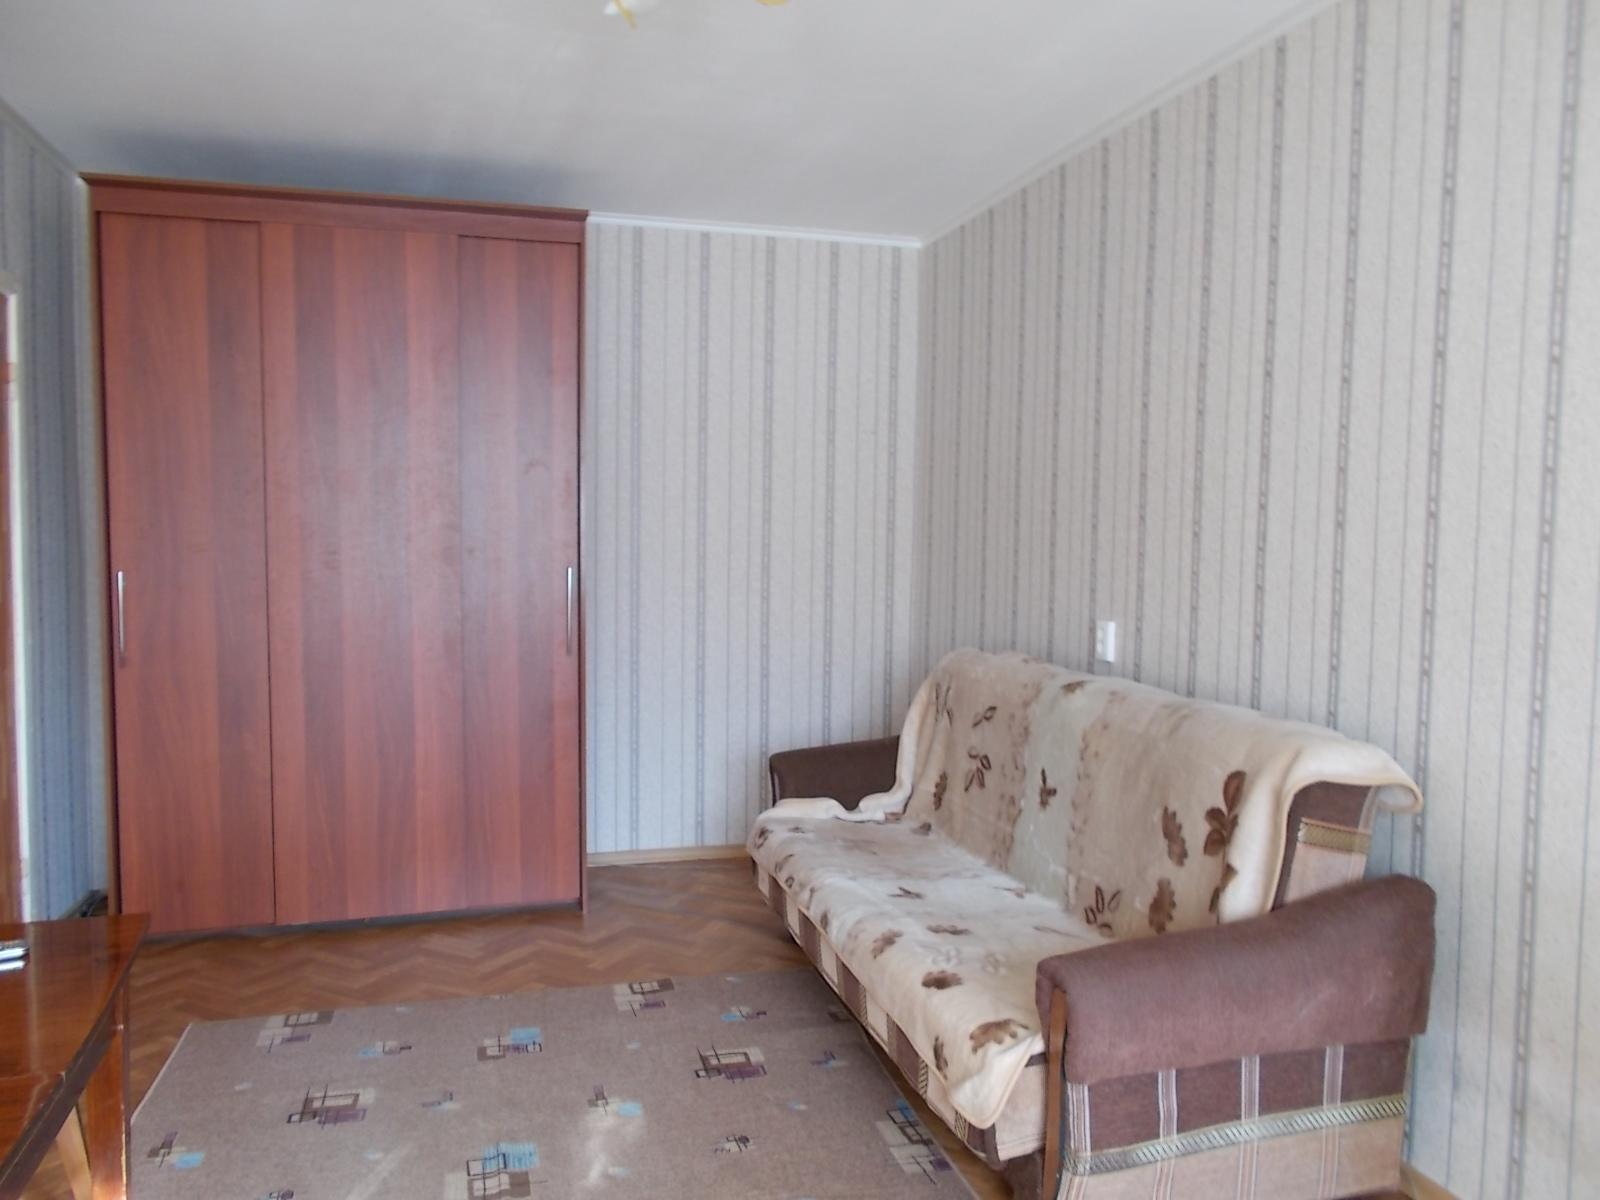 Продажа аренда квартир комнат офисов в санкт петербурге Аренда офиса 30 кв Трубная